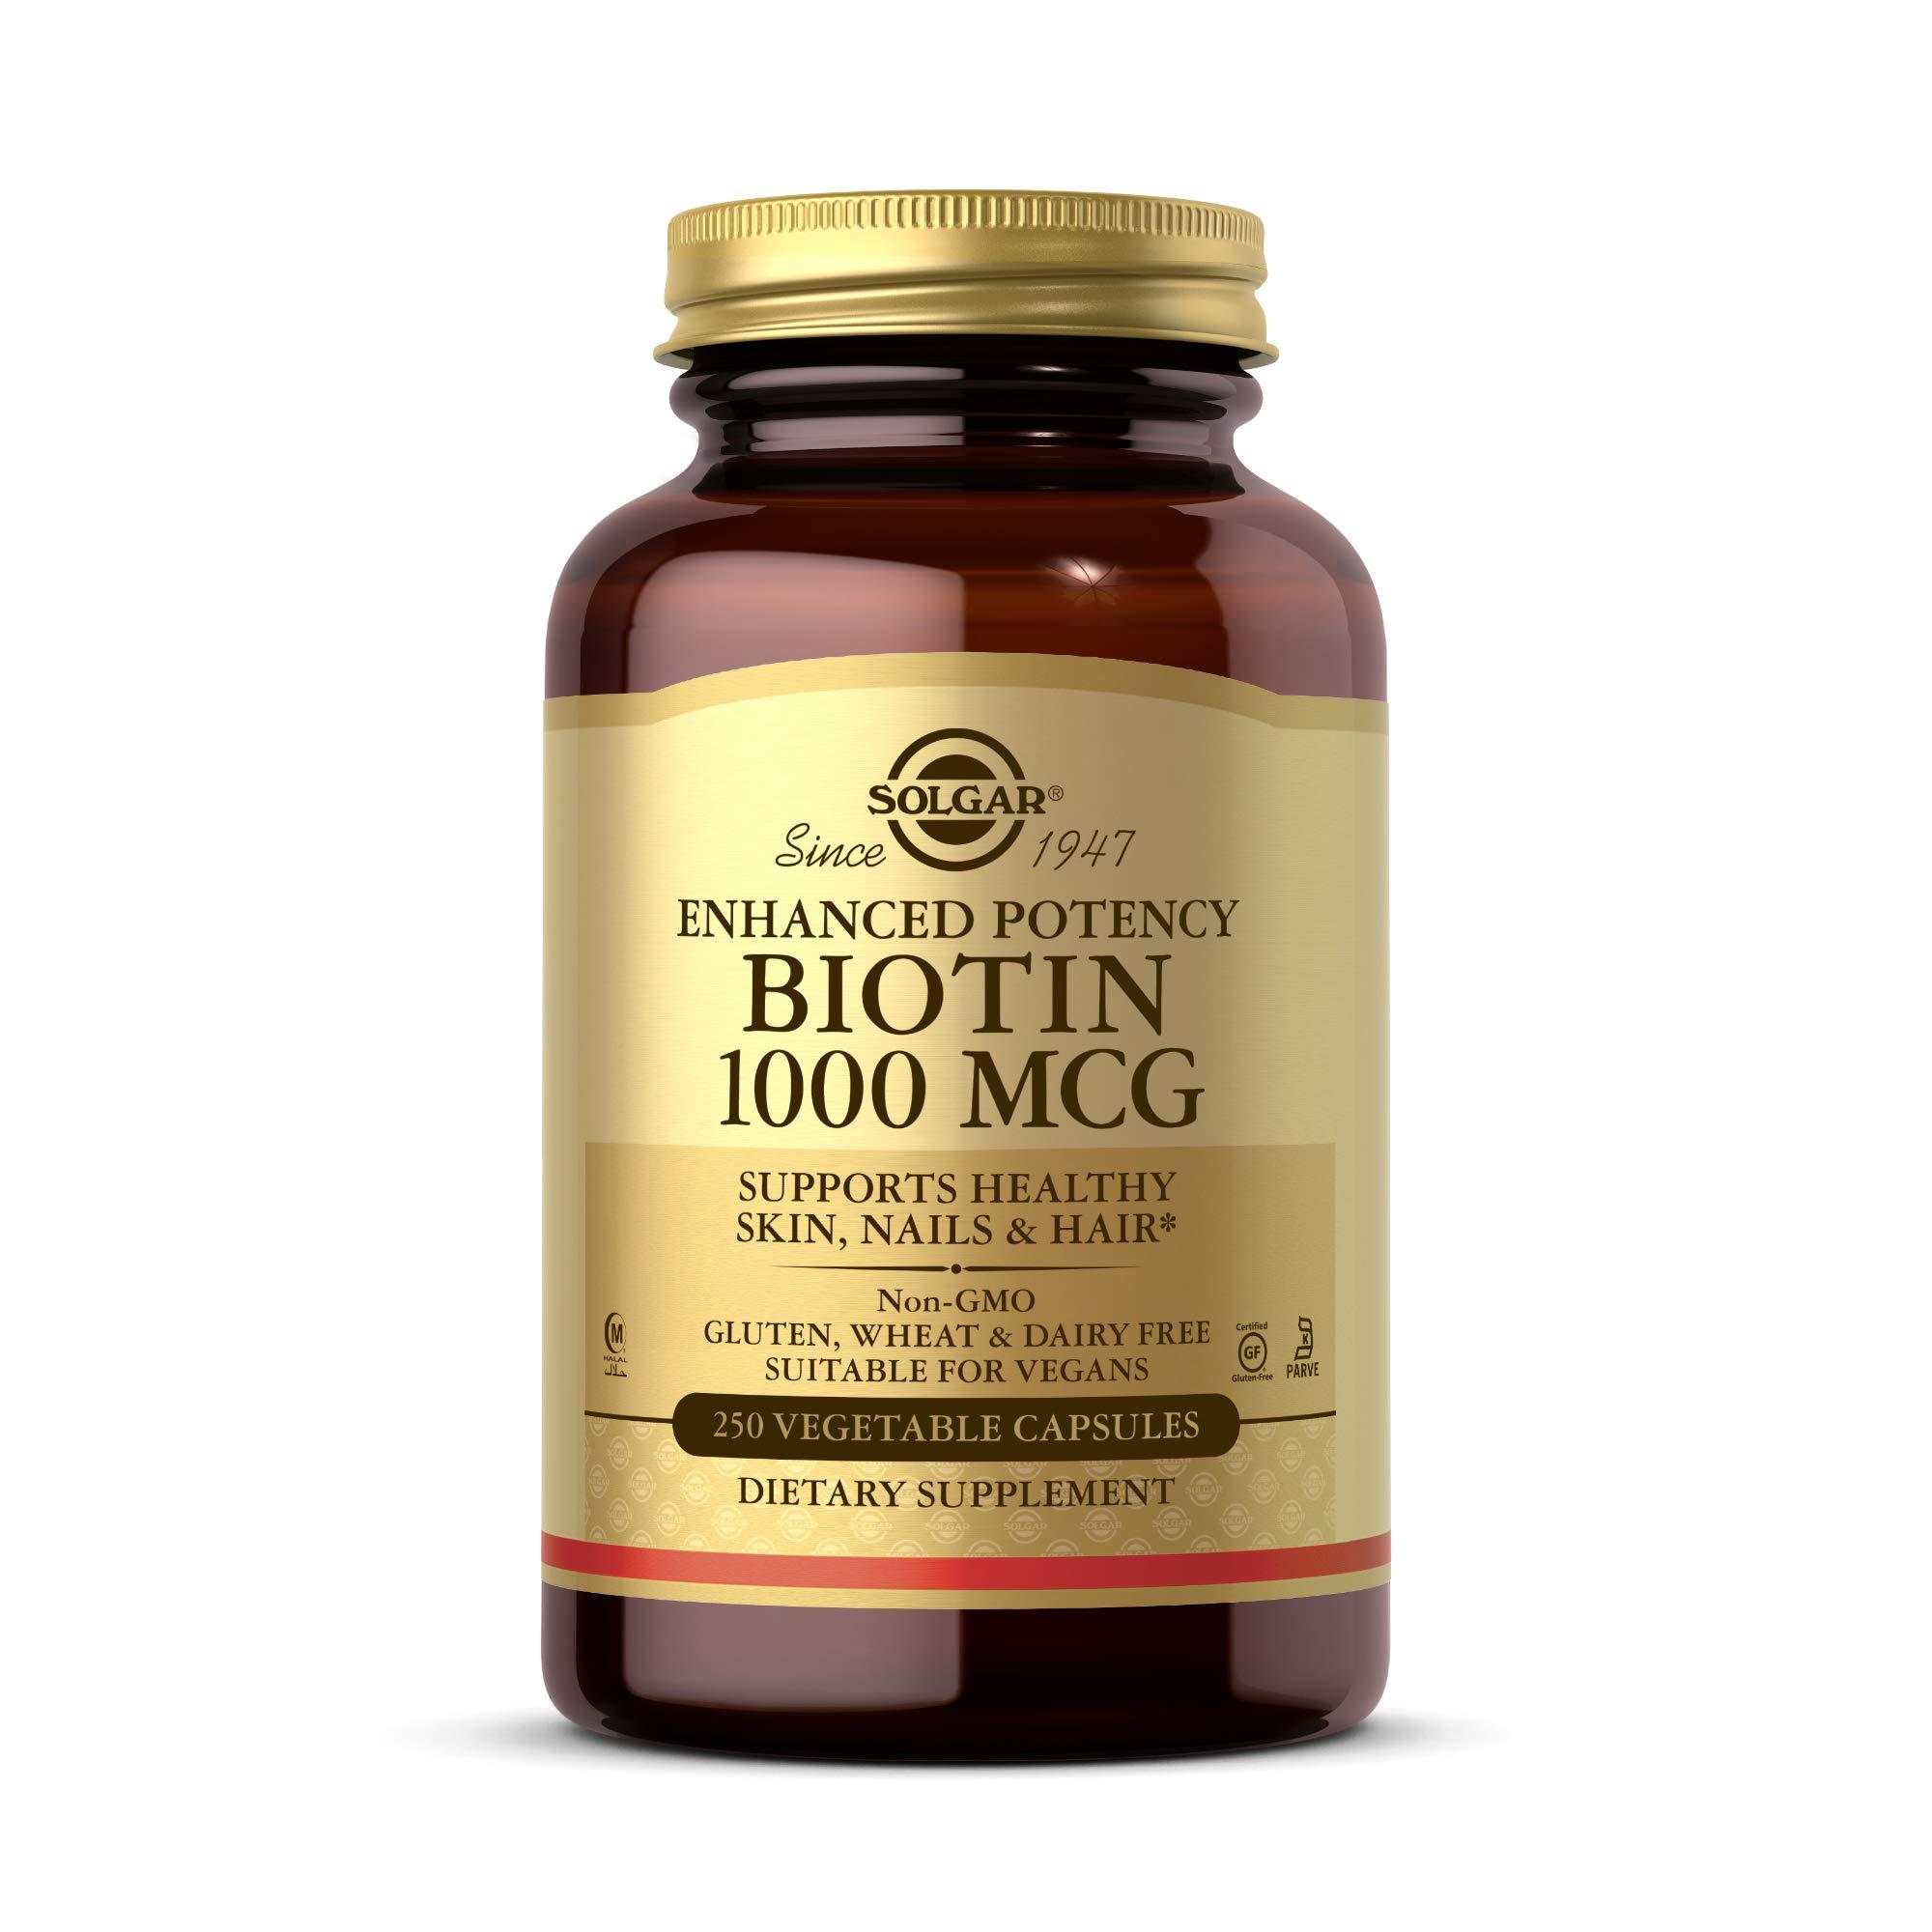 Solgar Biotin 1000 mcg, 250 Vegetable Capsules - Supports Healthy Skin, Nails & Hair - Energy Metabolism - Enhanced Potency - Non-GMO, Vegan, Gluten Free, Dairy Free, Kosher, Halal - 250 Servings